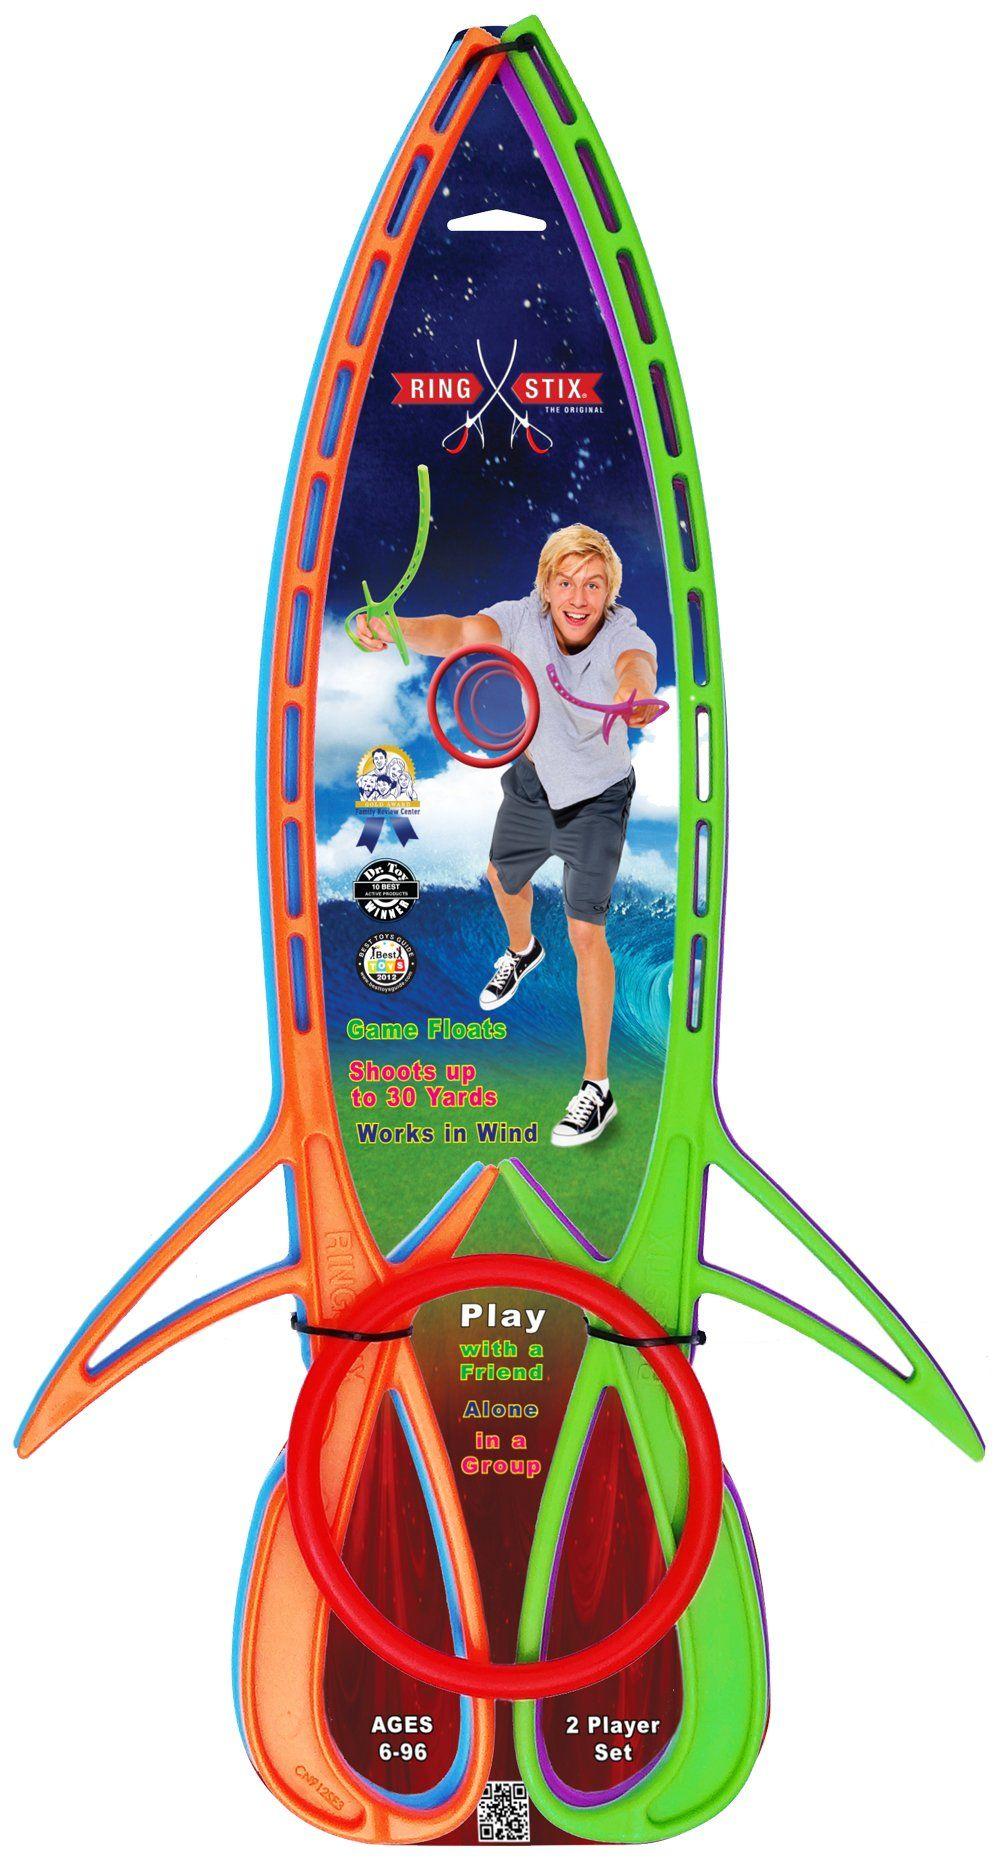 Amazon.com: RingStix Lite: Toys & Games